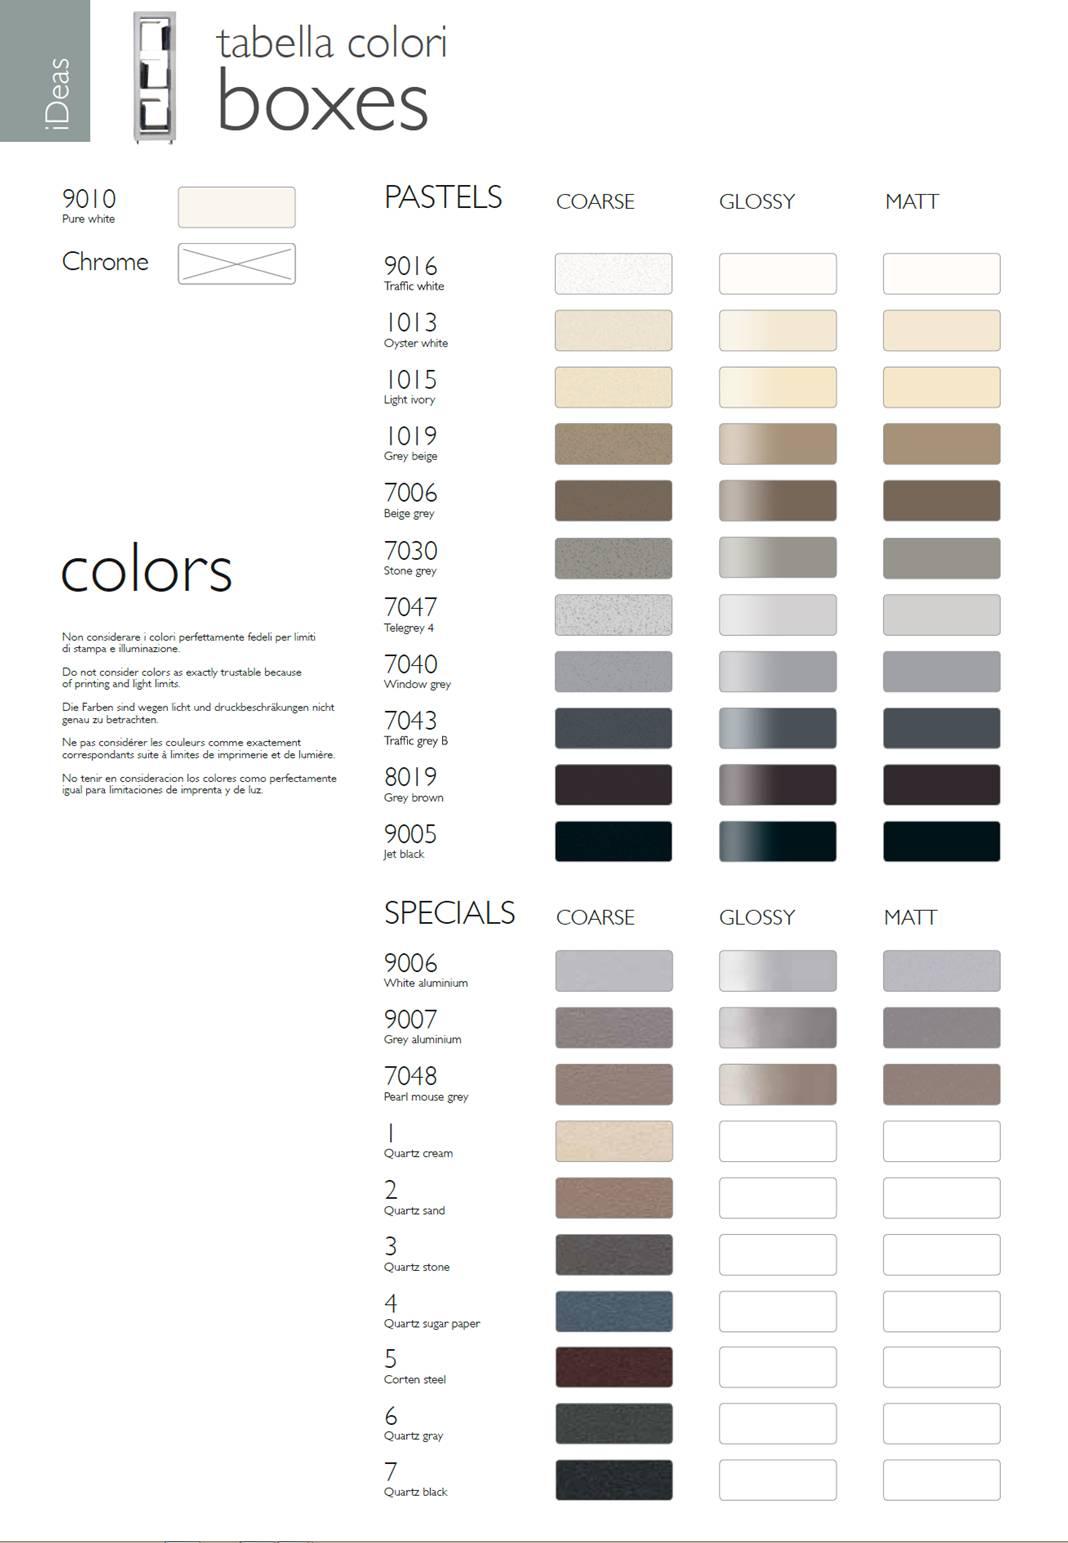 tabella_colori_boxes_deltacalor